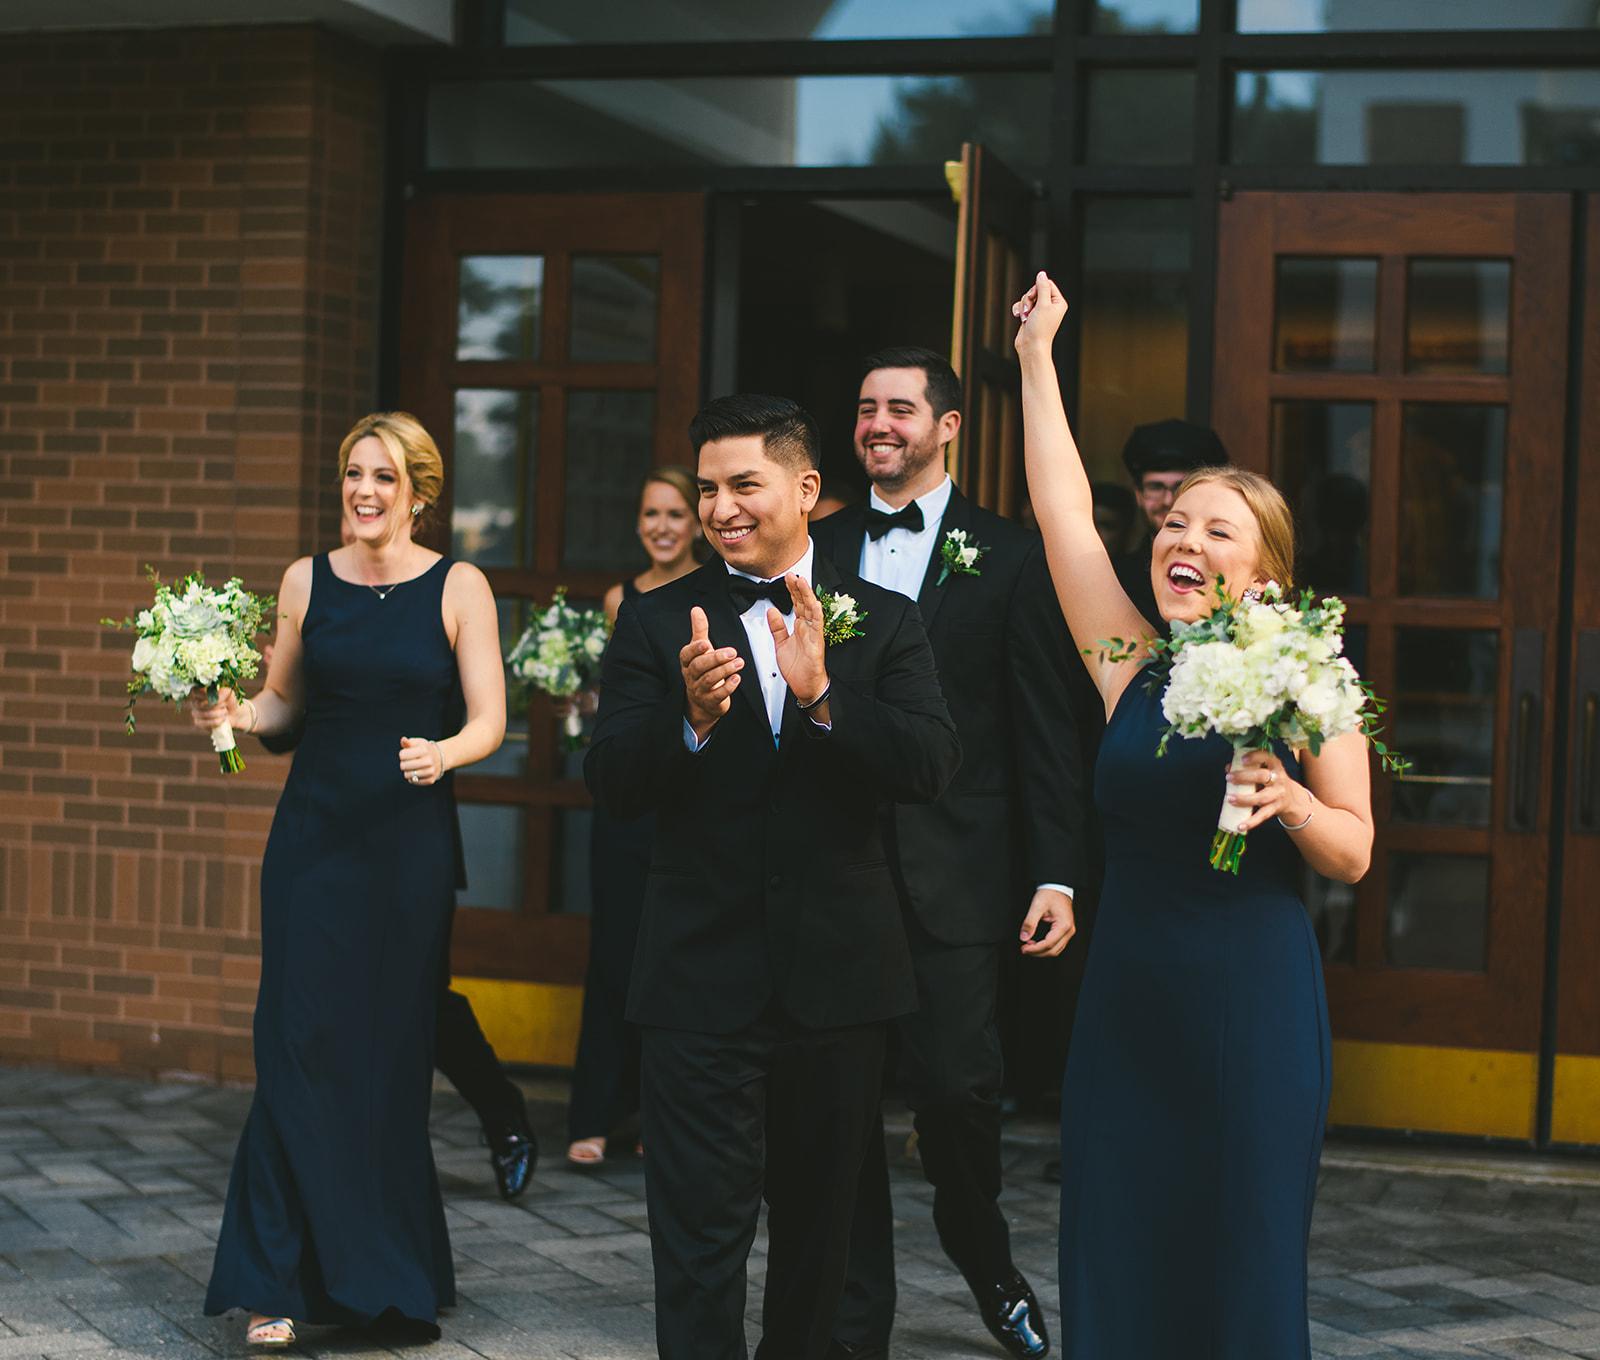 10 bridal party at Fairfield University Wedding.jpg